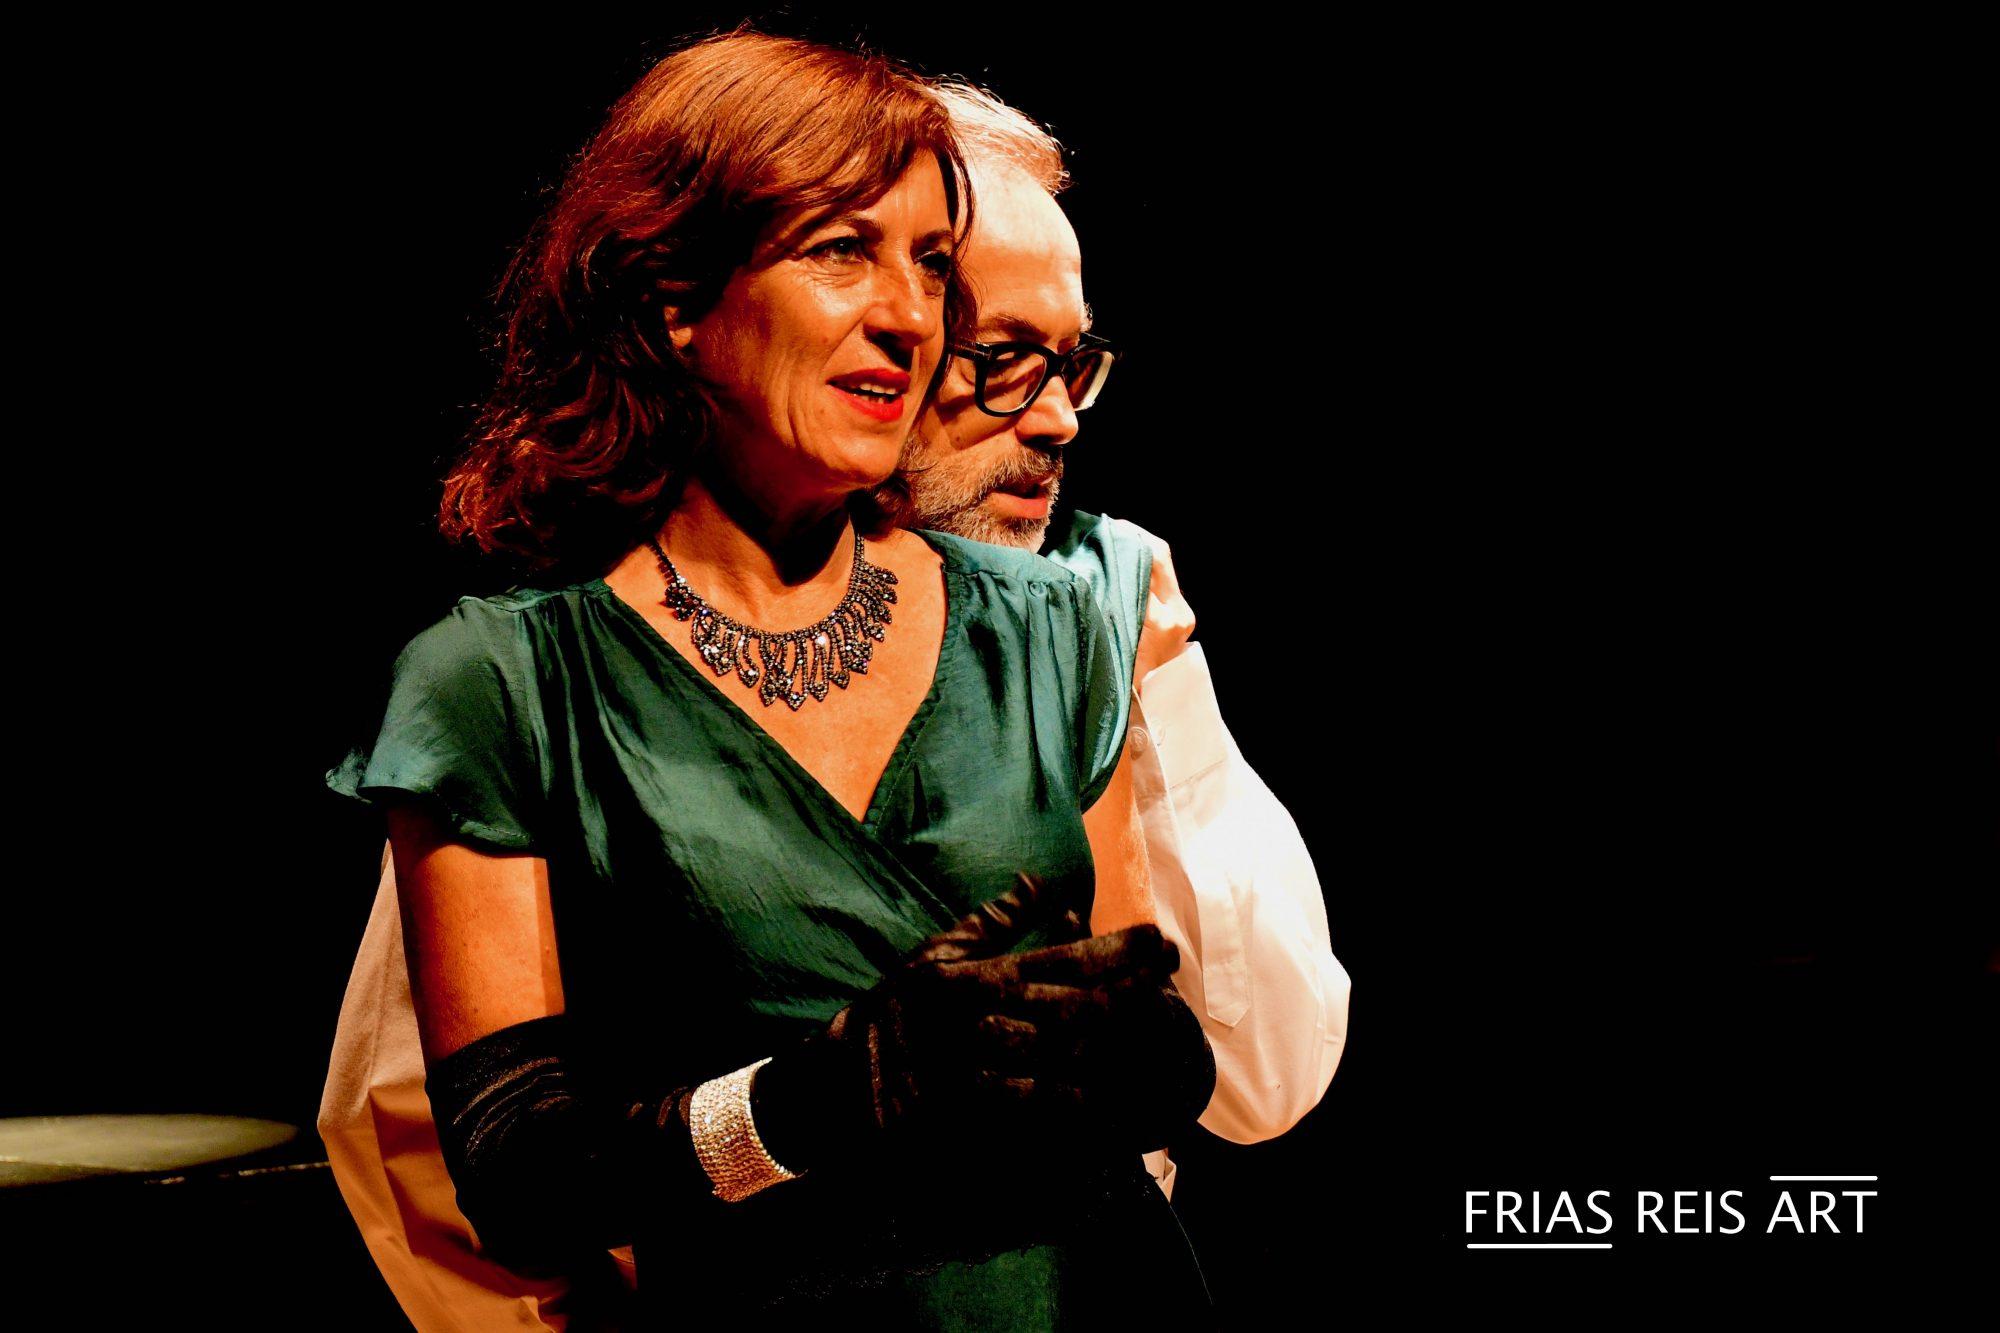 © Frias Reis